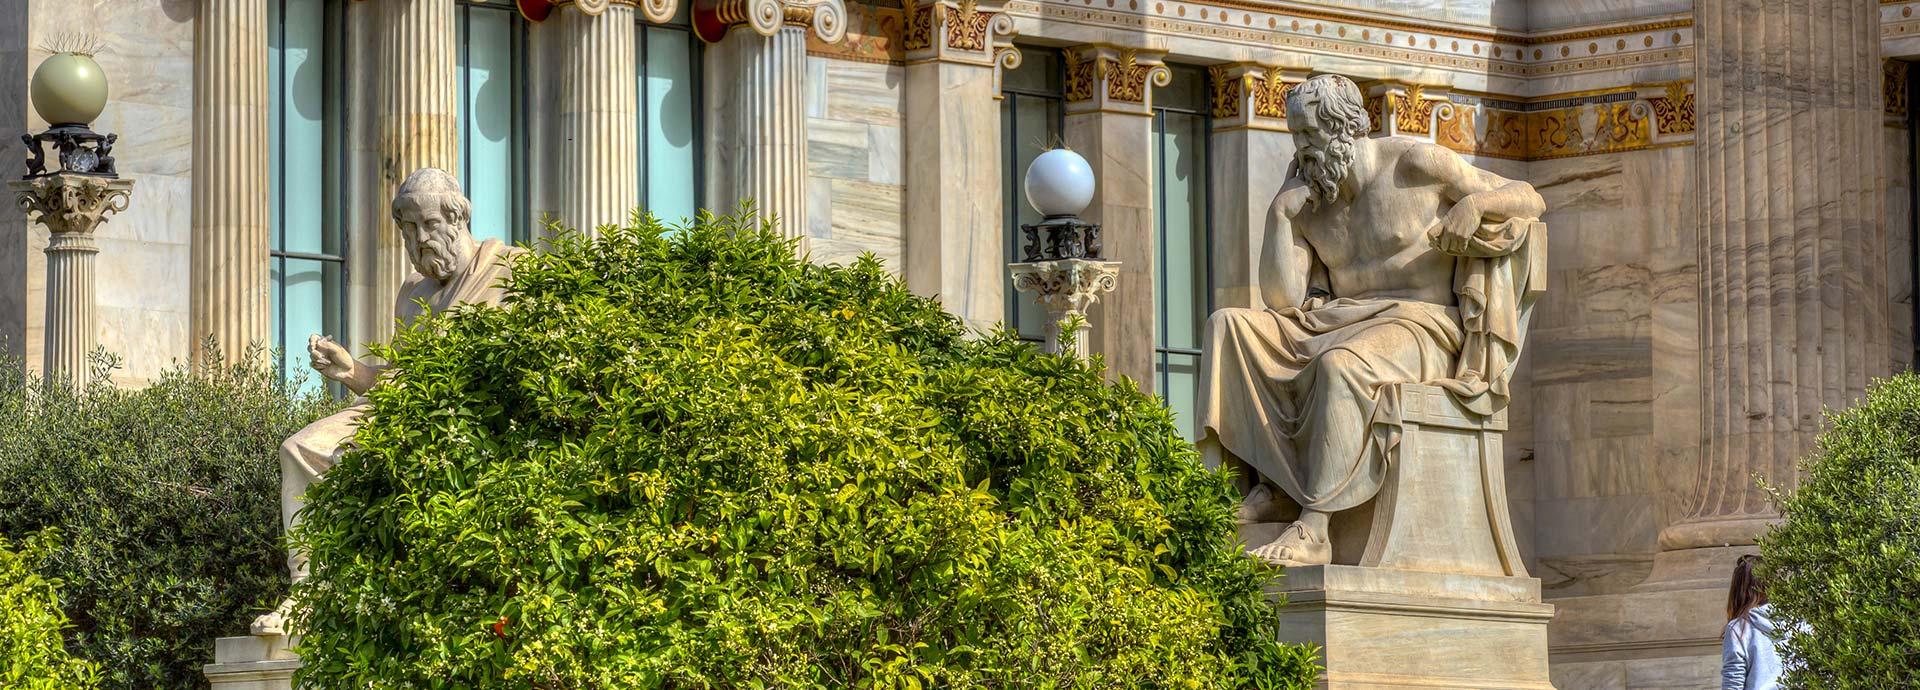 Athens Jewish Tour and city sites. Tours by PrivateToursAthens